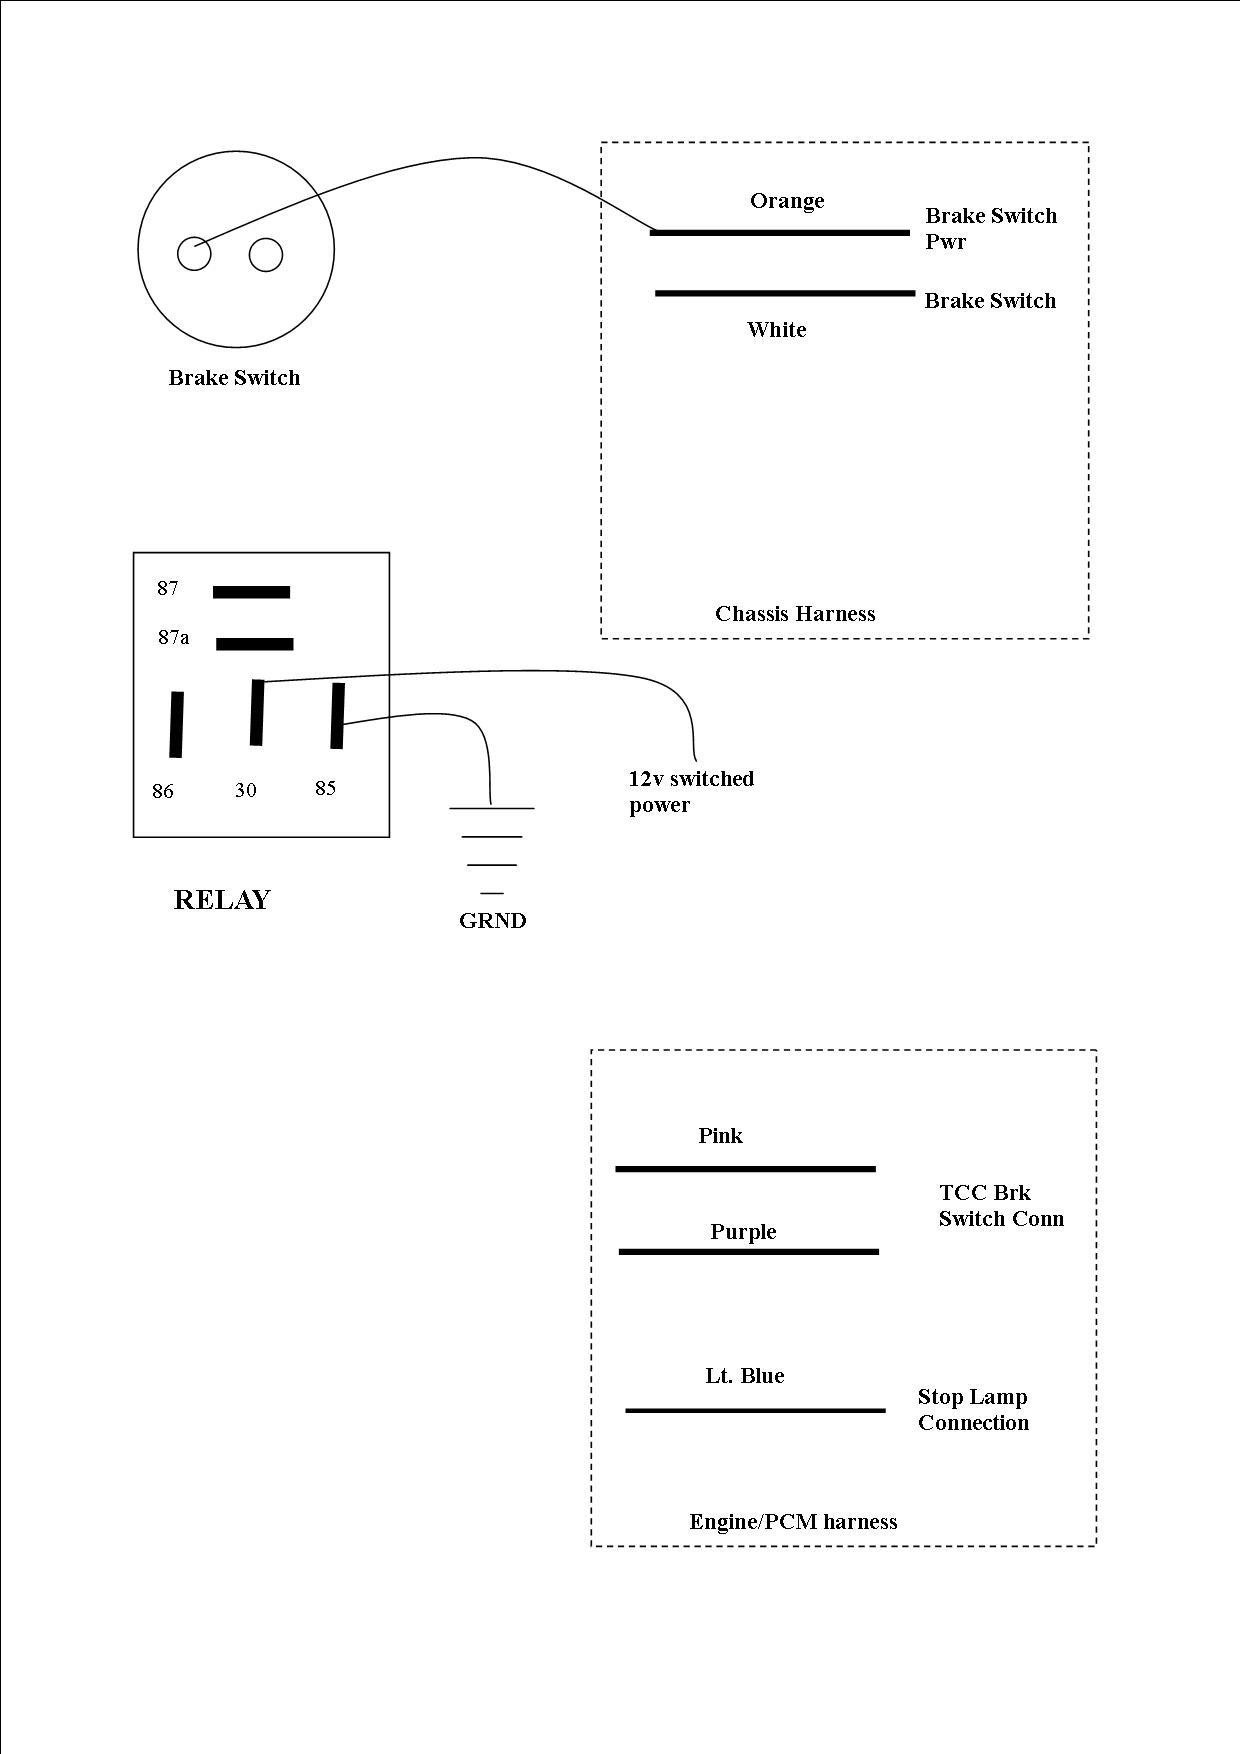 375329d1349387564 tcc wiring tcc relay wiring?resize=665%2C941&ssl=1 700r4 tcc wiring diagram the best wiring diagram 2017  at fashall.co